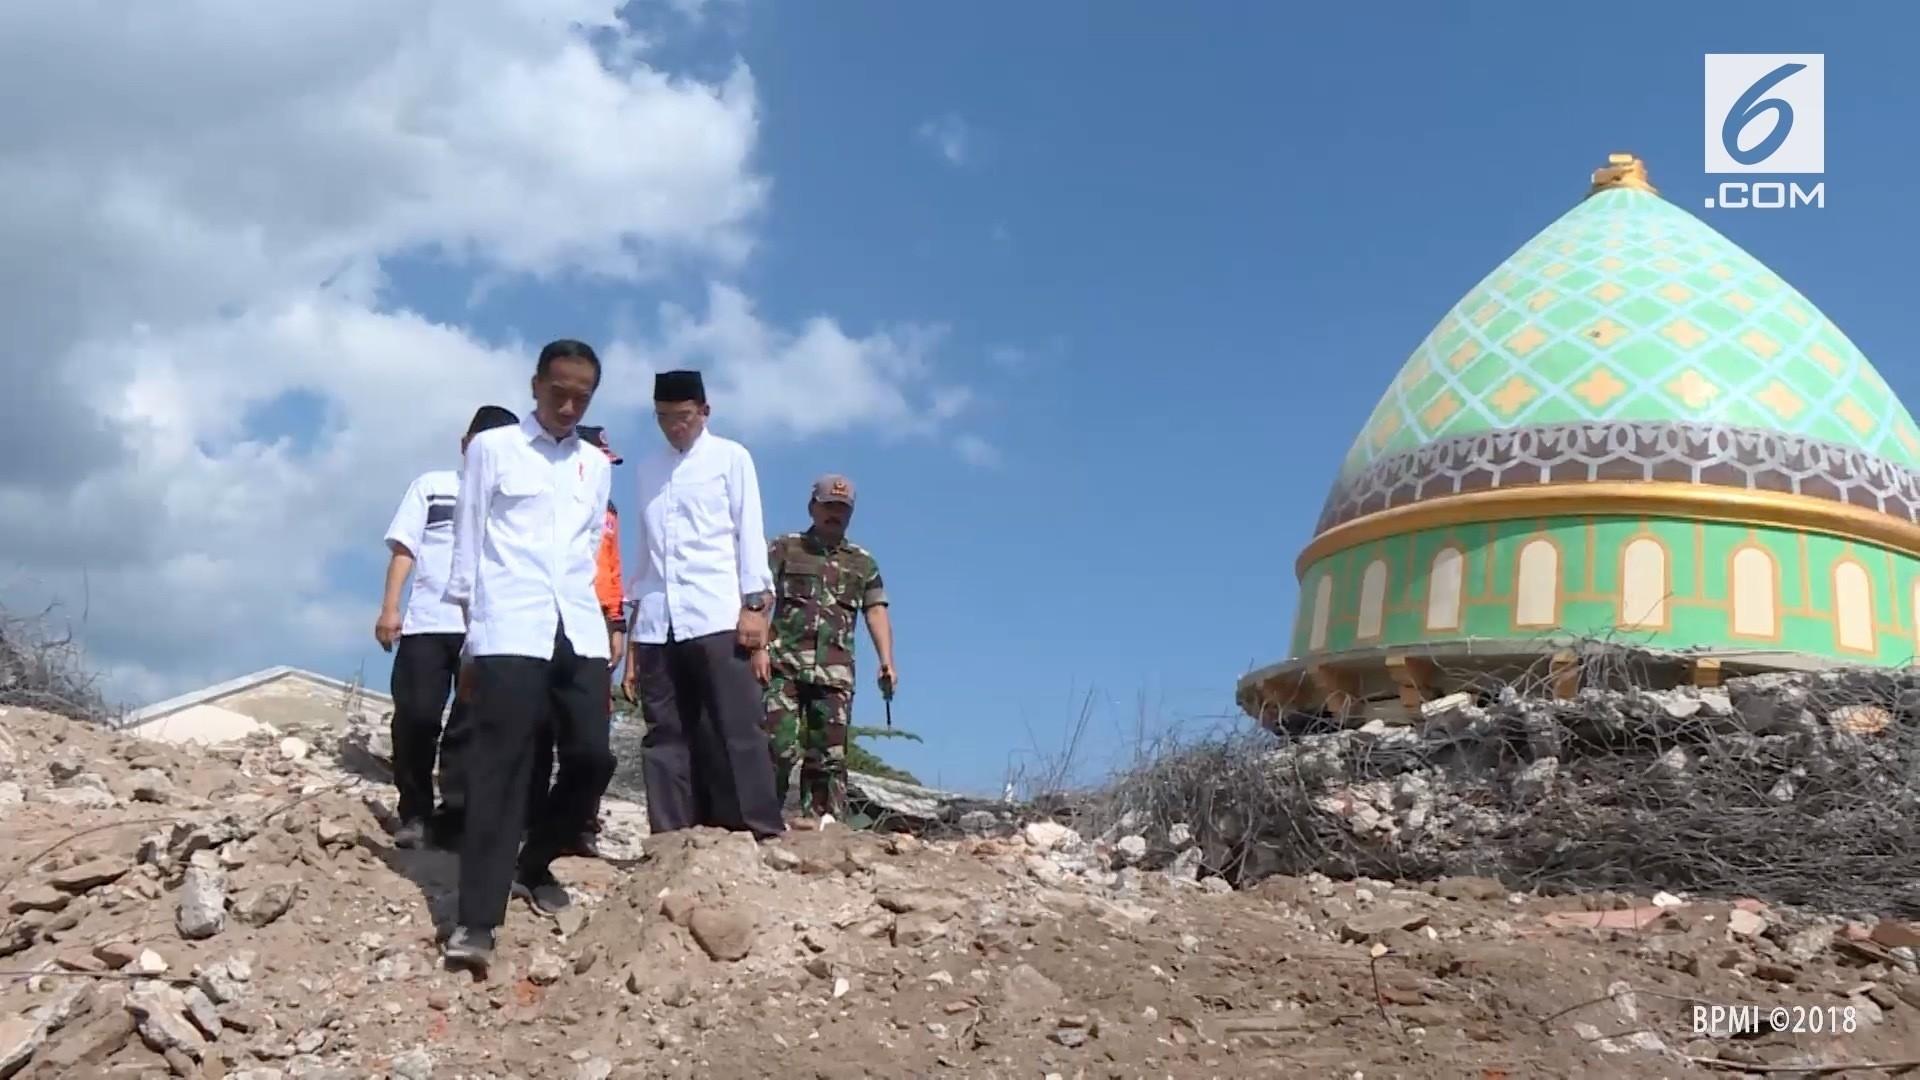 Tinjau Masjid di Lombok, Jokowi Jalan Kaki 100 Meter - Vidio com